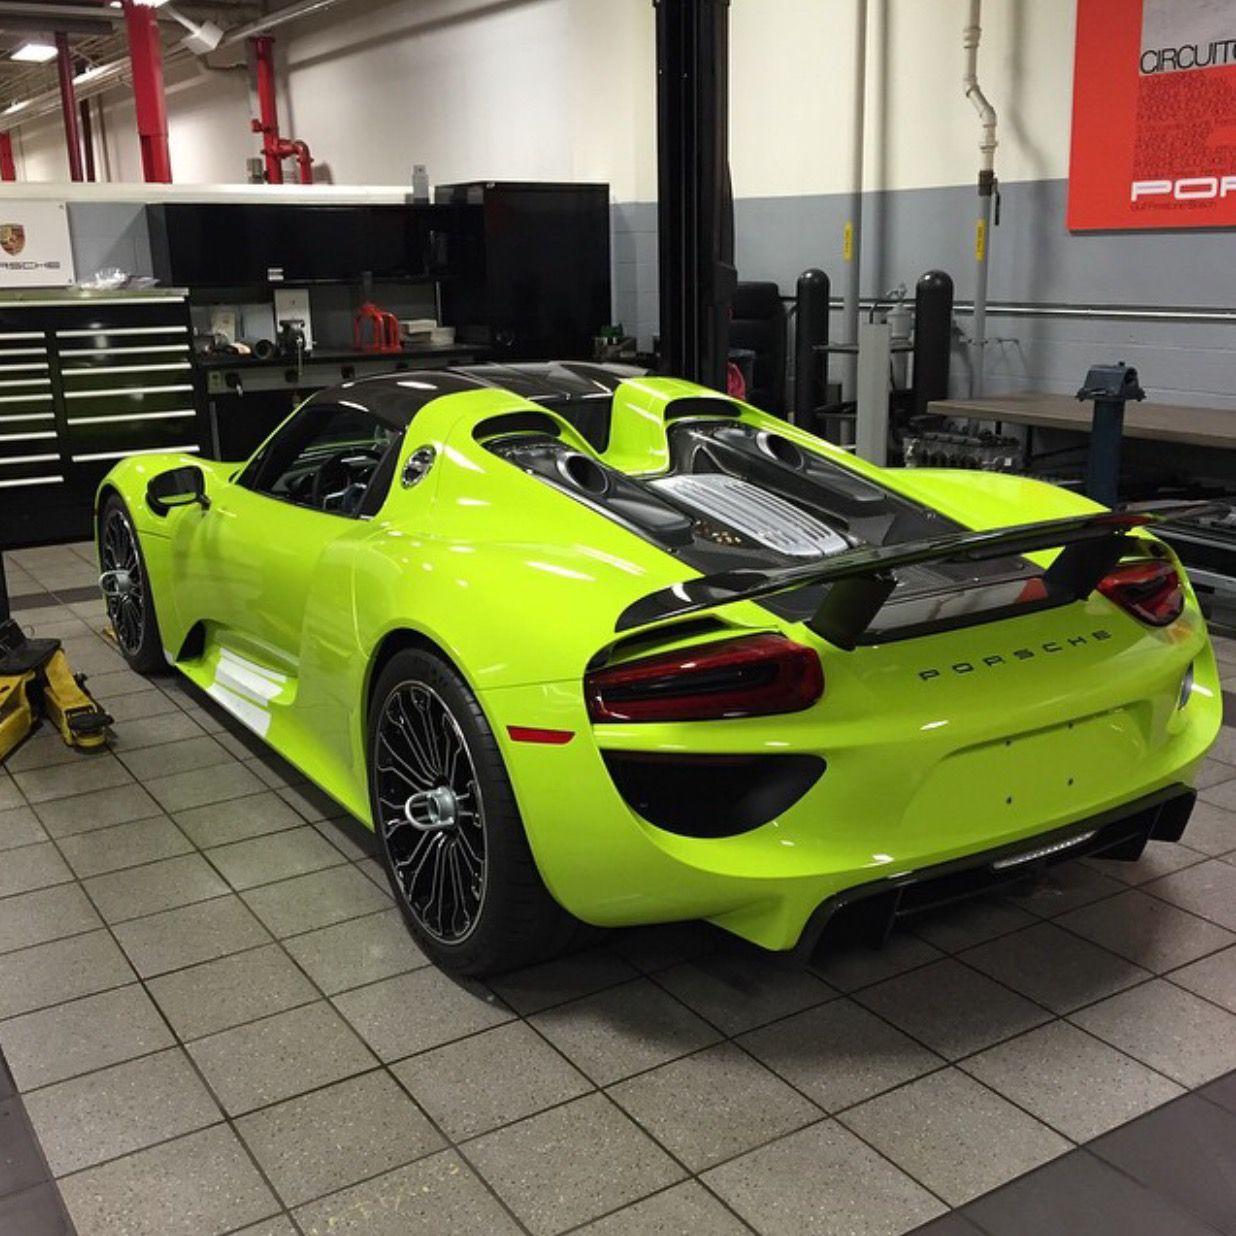 Porsche 918 Spyder Painted In Acid Green Photo Taken By Jimmyrepasi On Instagram